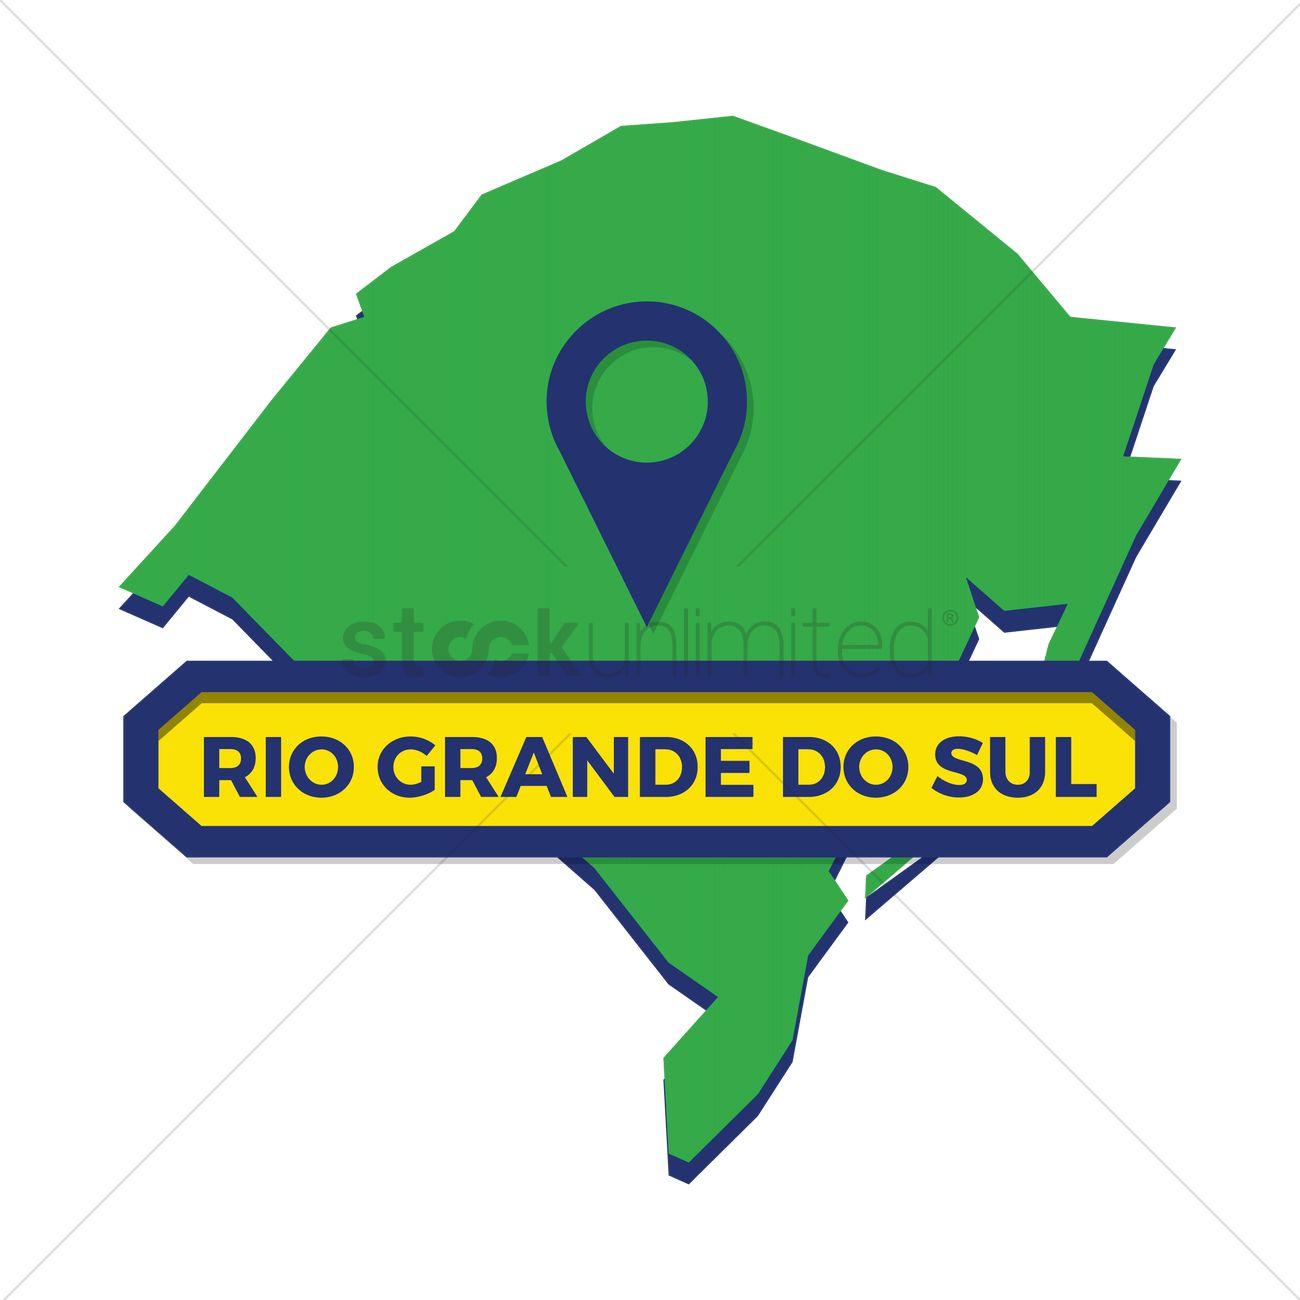 Rio grande do sul map with map pin Vector Image.